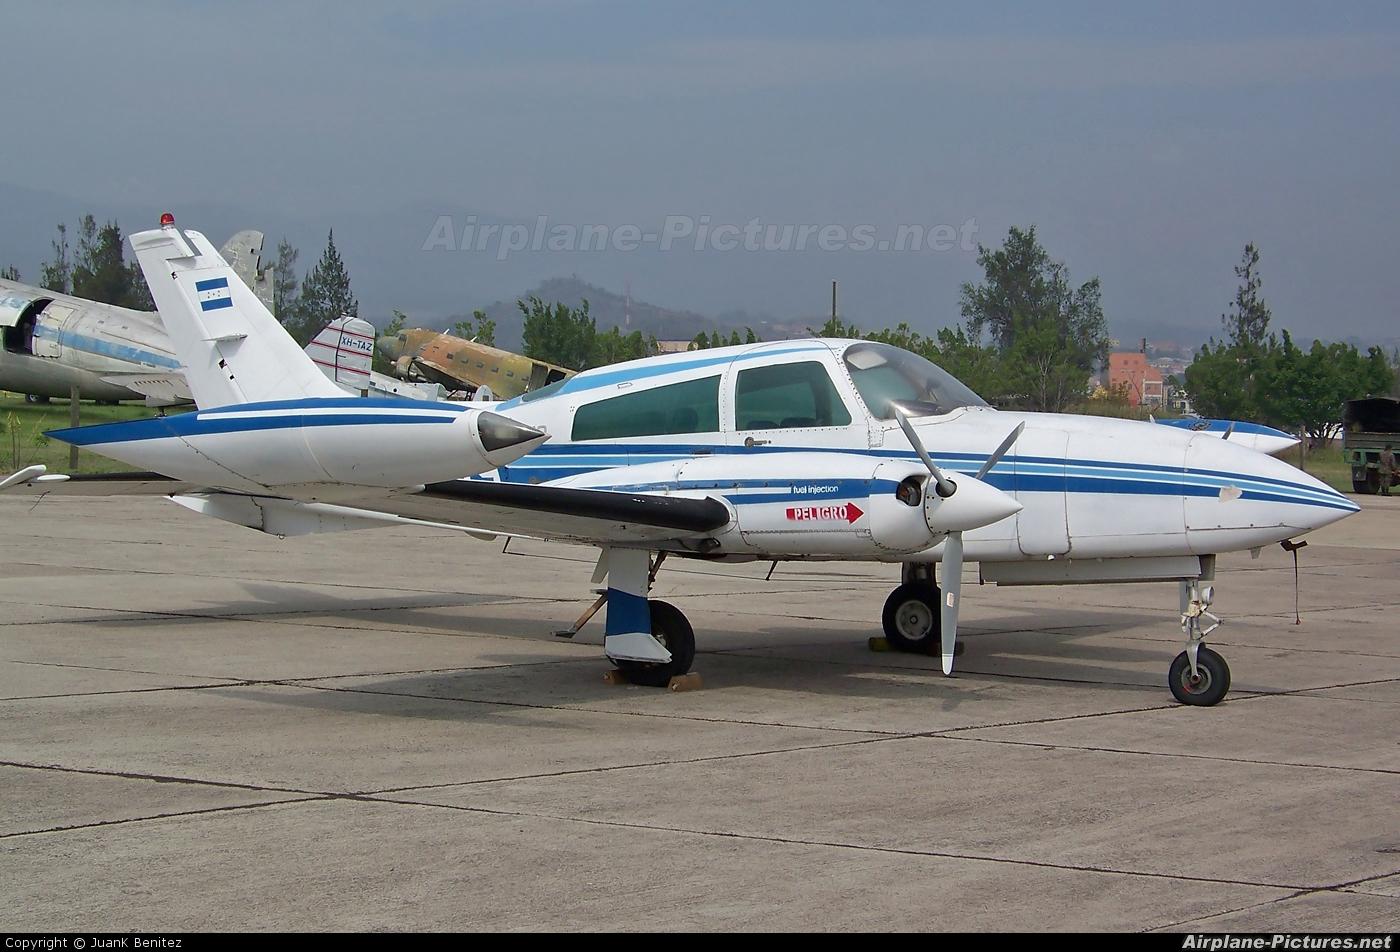 Honduras - Air Force FAH-009 aircraft at Tegucigalpa - Toncontin